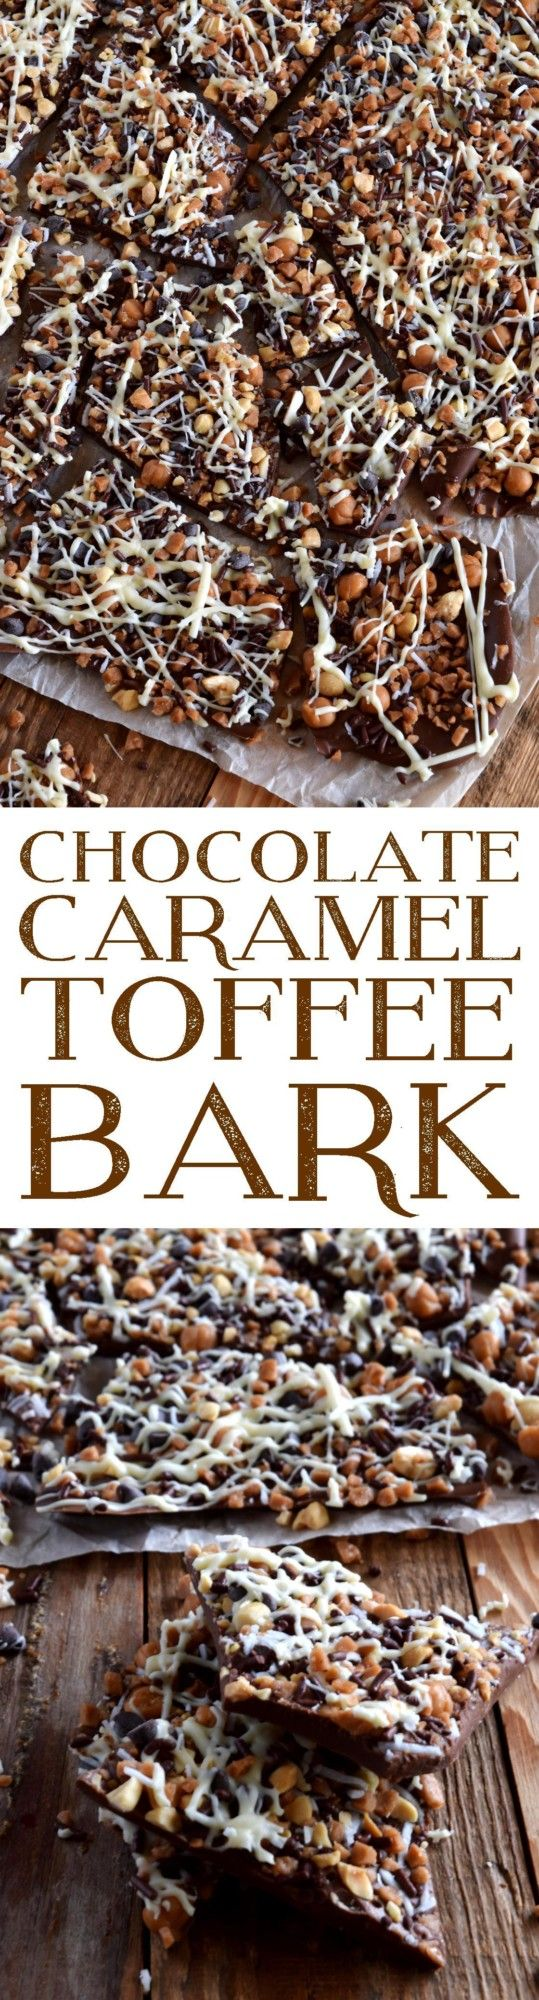 Chocolate Caramel Toffee Bark